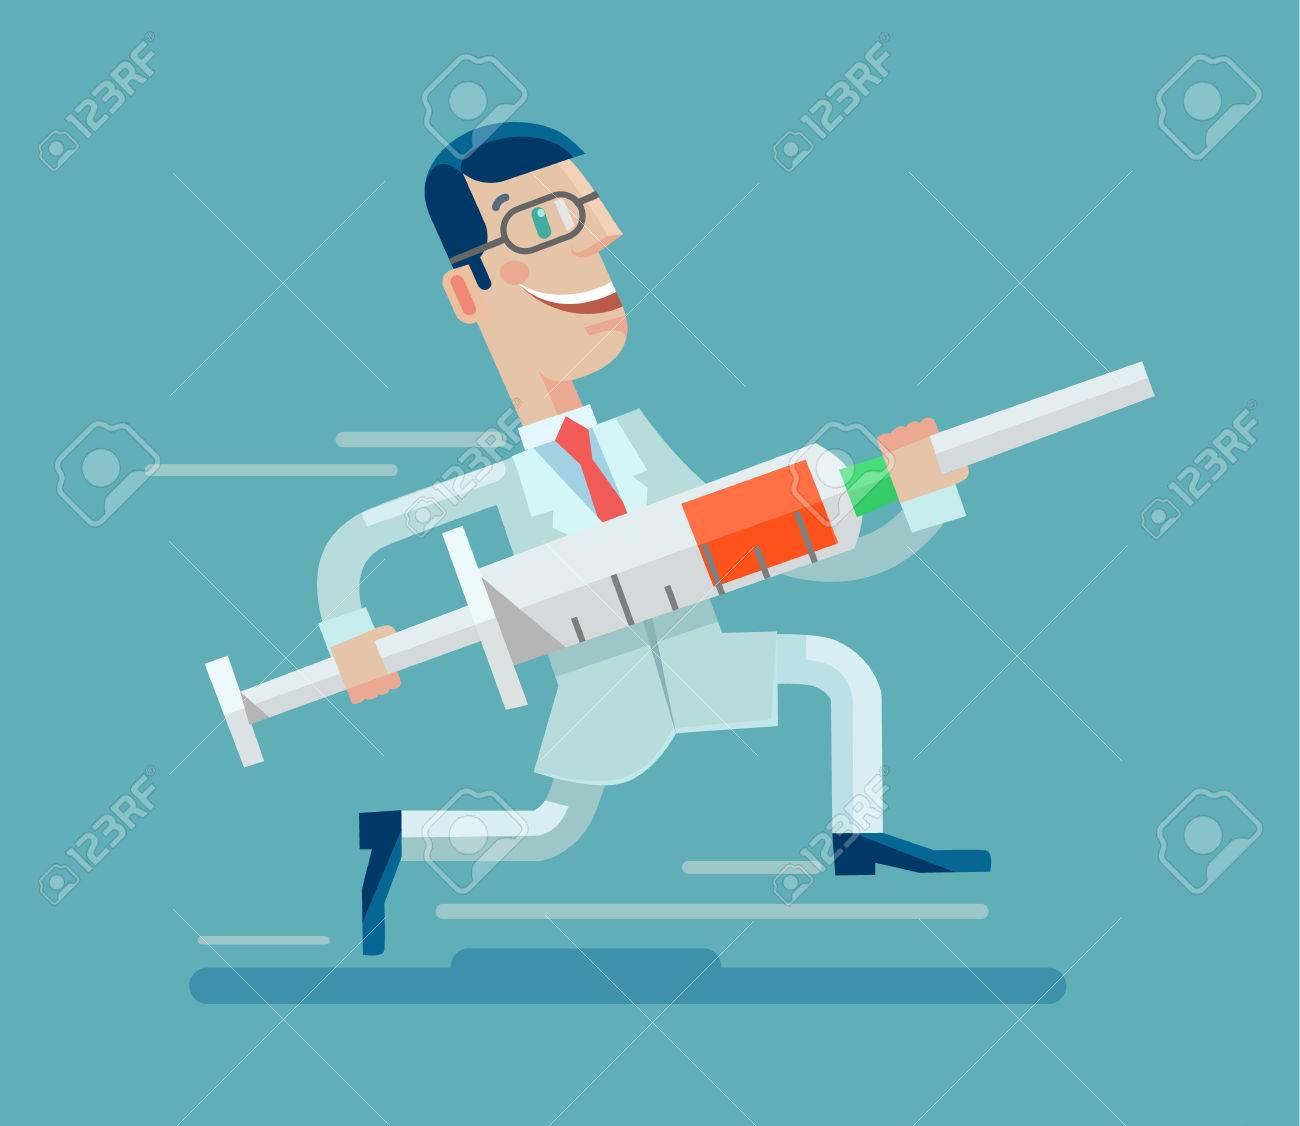 Doctor run with syringe. Vector flat illustration - 54243352